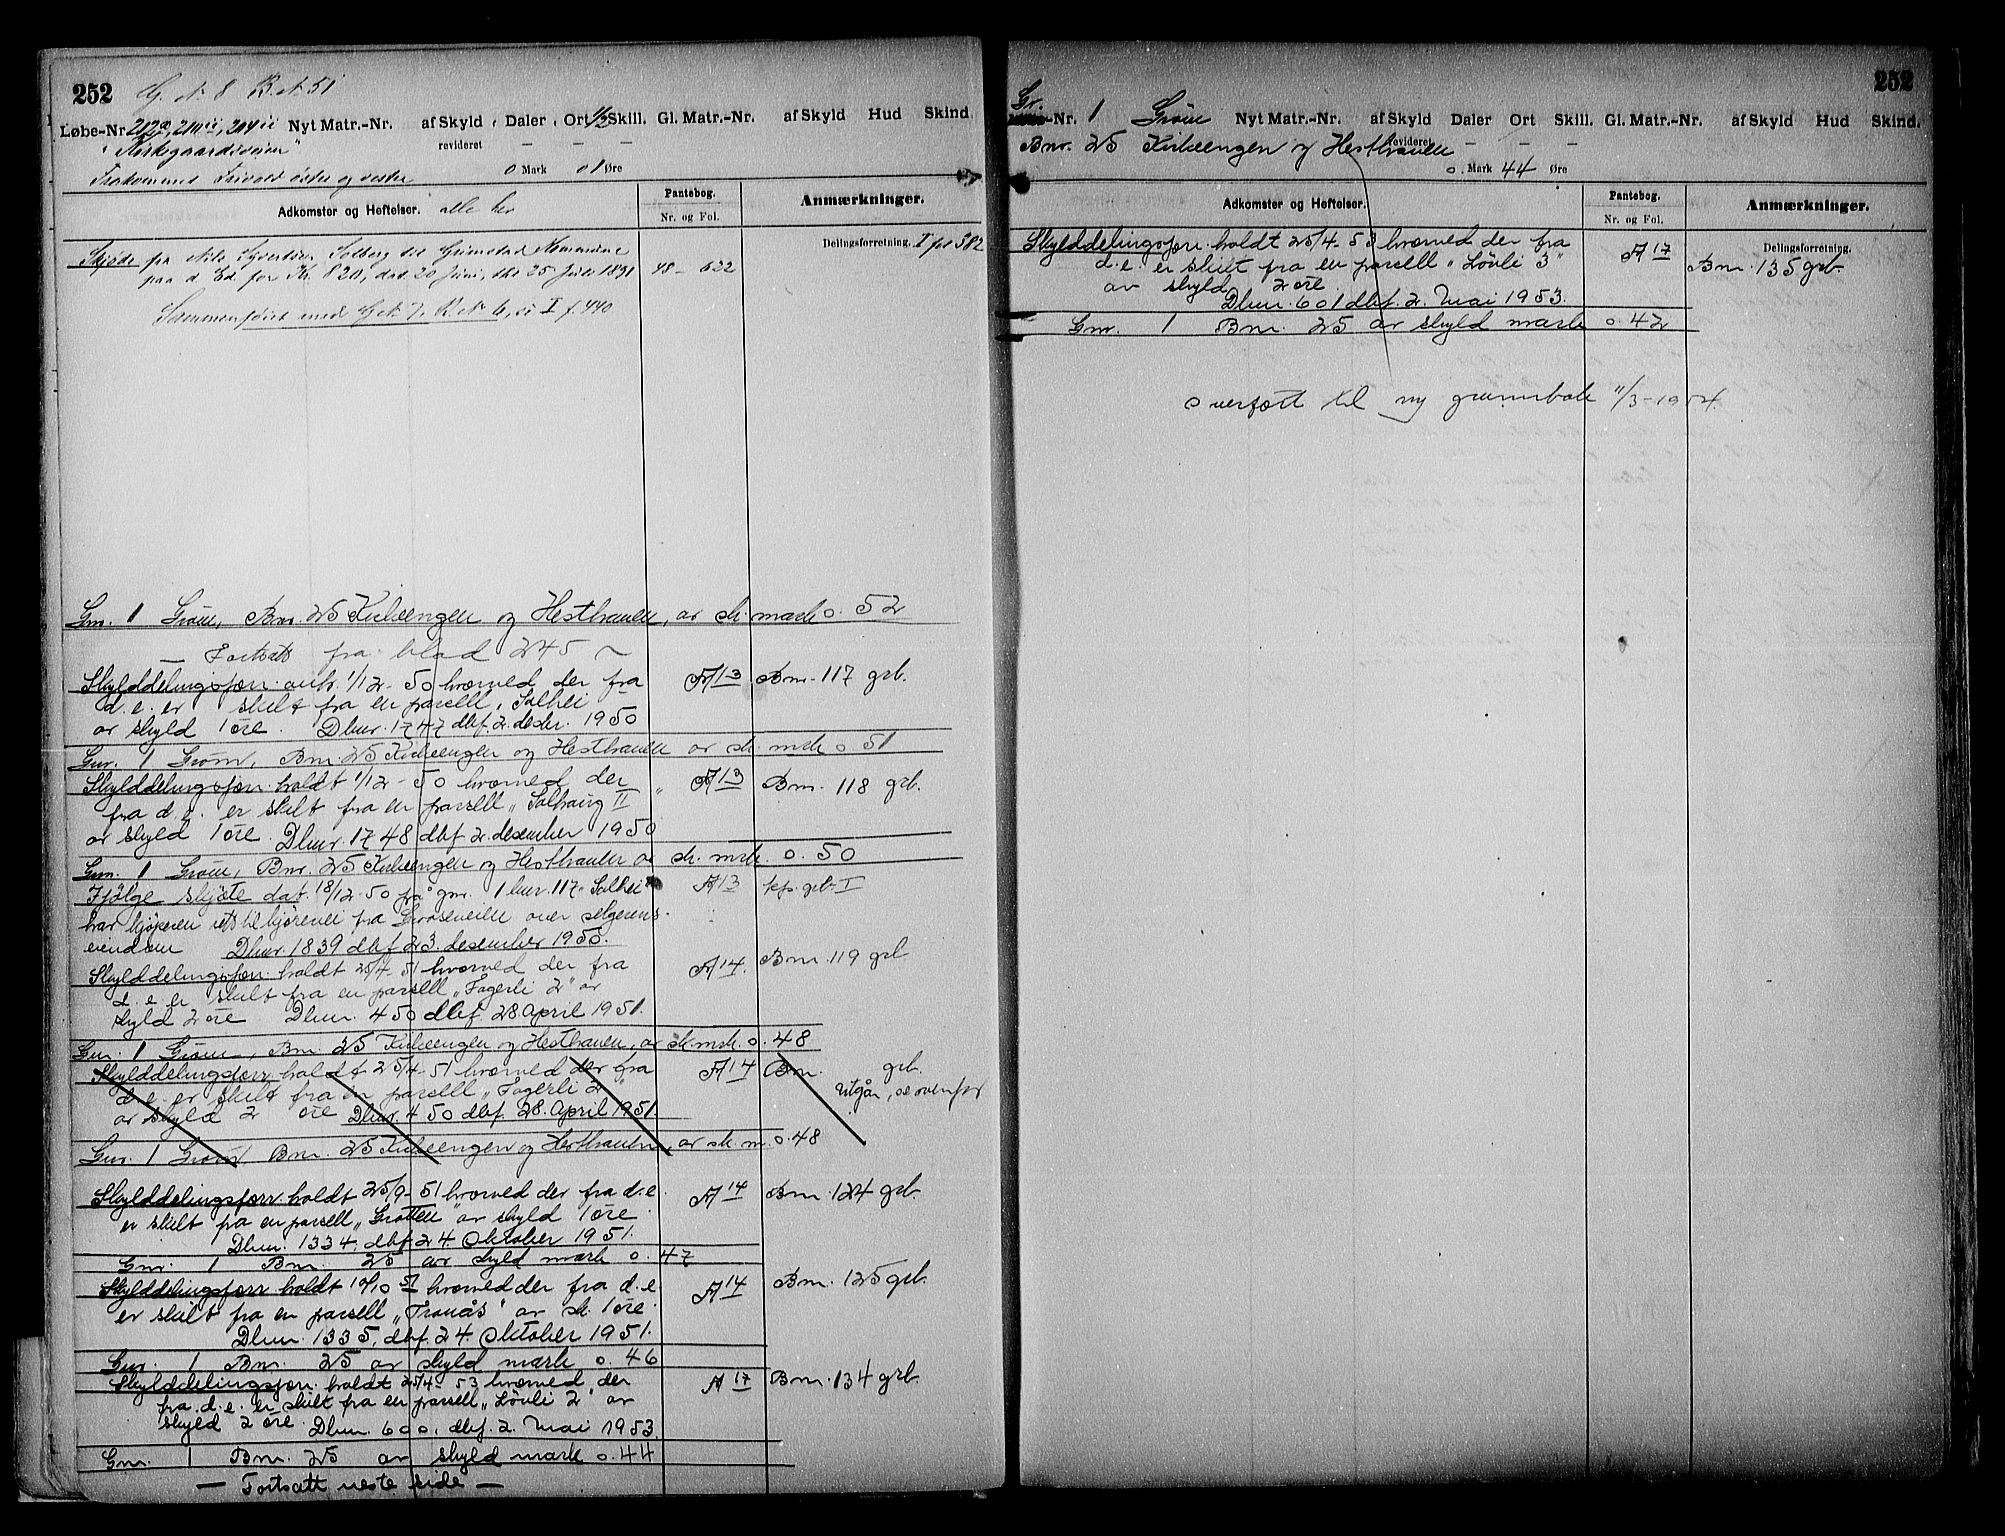 SAK, Vestre Nedenes/Sand sorenskriveri, G/Ga/L0018: Panteregister nr. 13b, 1872-1956, s. 252